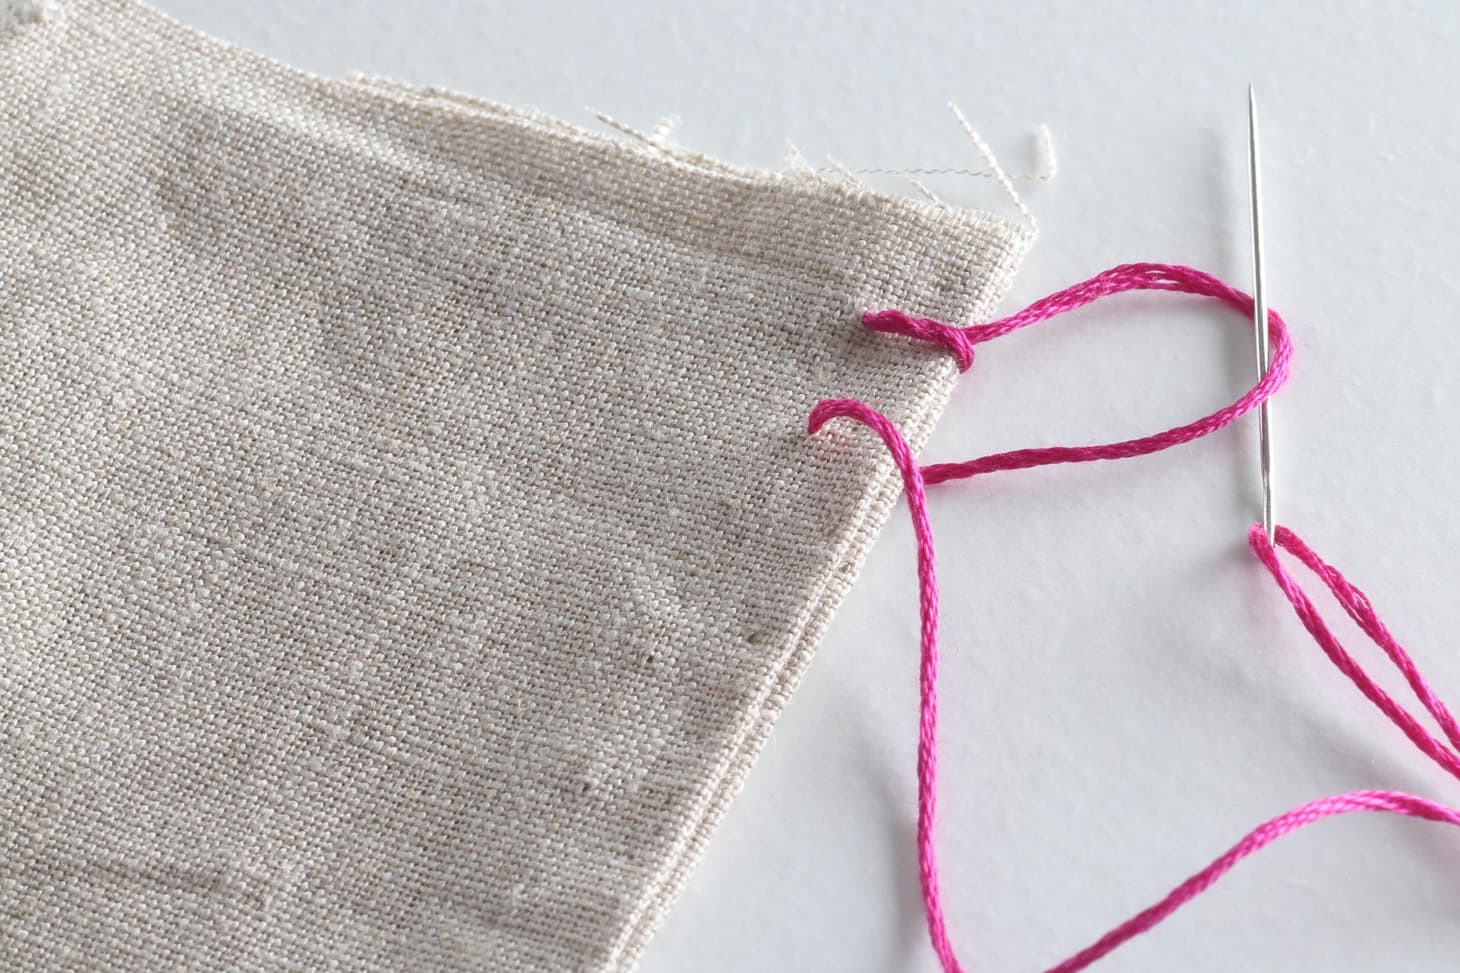 How to Hand Sew: 6 Basic Stitch Photo Tutorials   Apartment